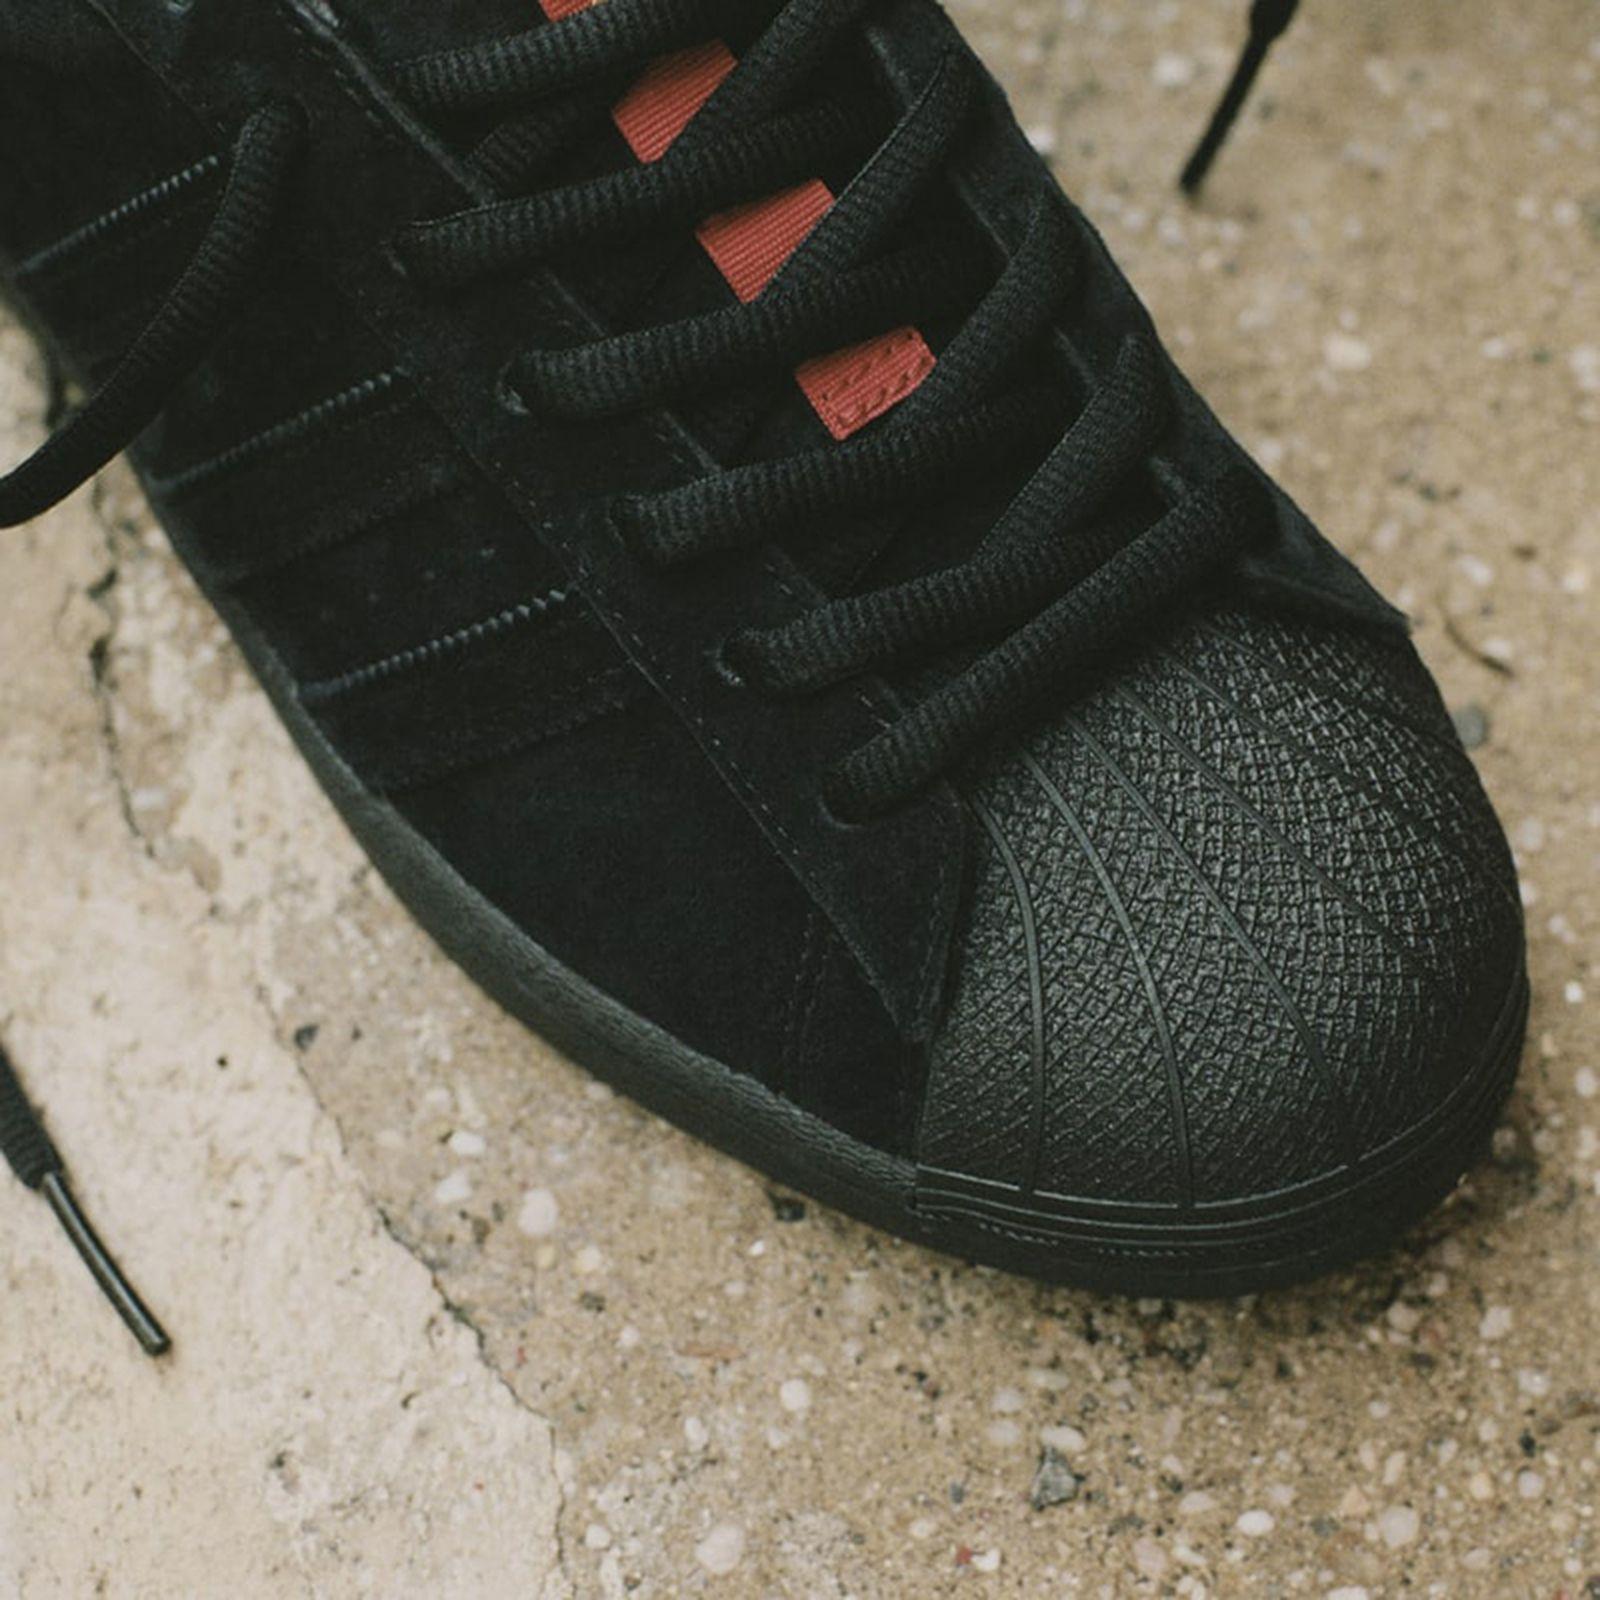 thrasher-adidas-superstar-adv-tyshawn-jones-release-date-price-04